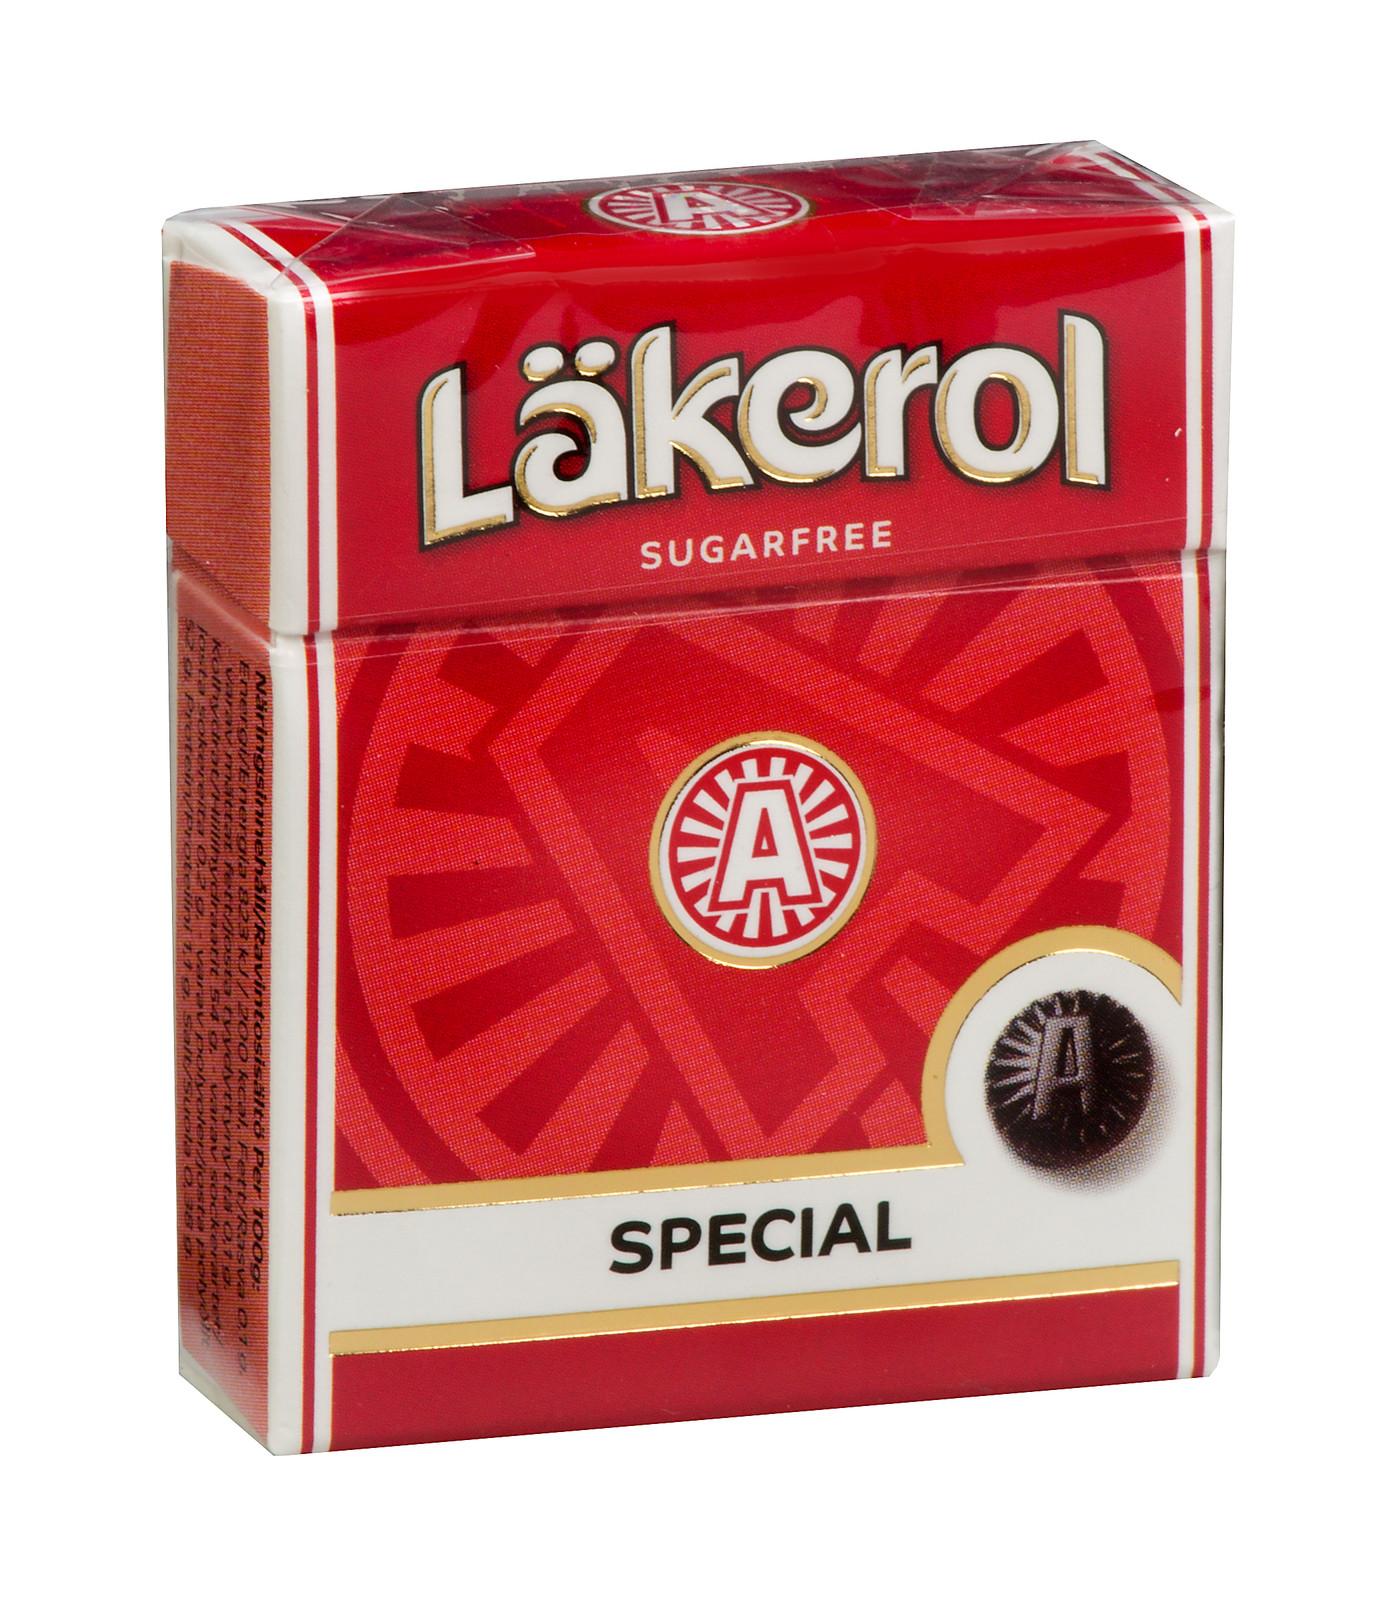 Lakerol Special Menthol Licorice Lozenges